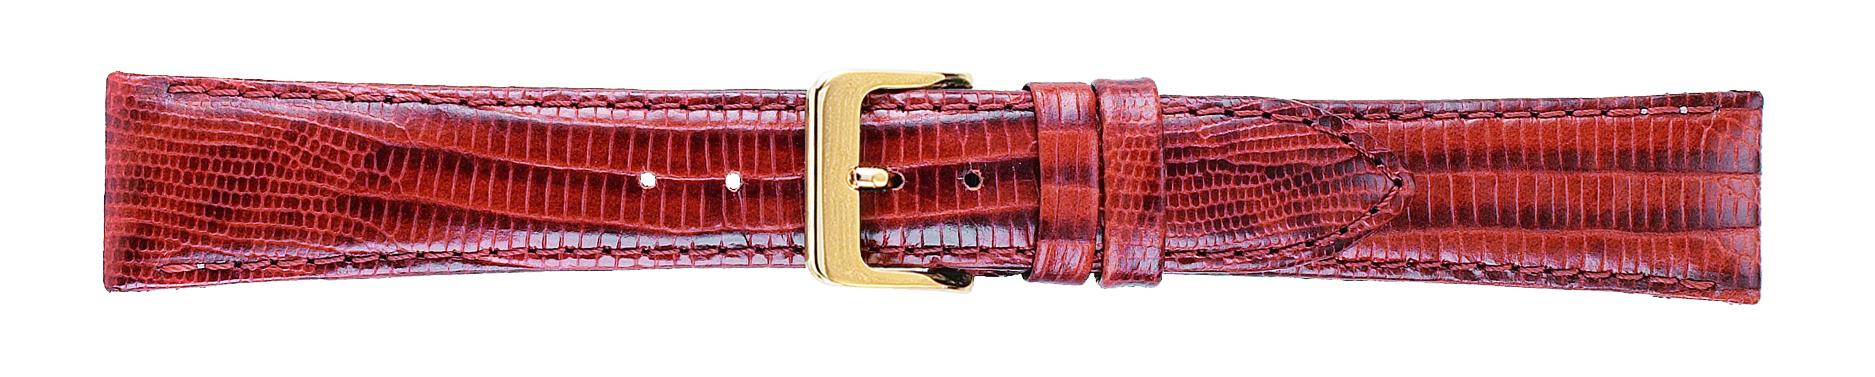 18mm Teju Lizard Grain Honey Brown Leather Strap